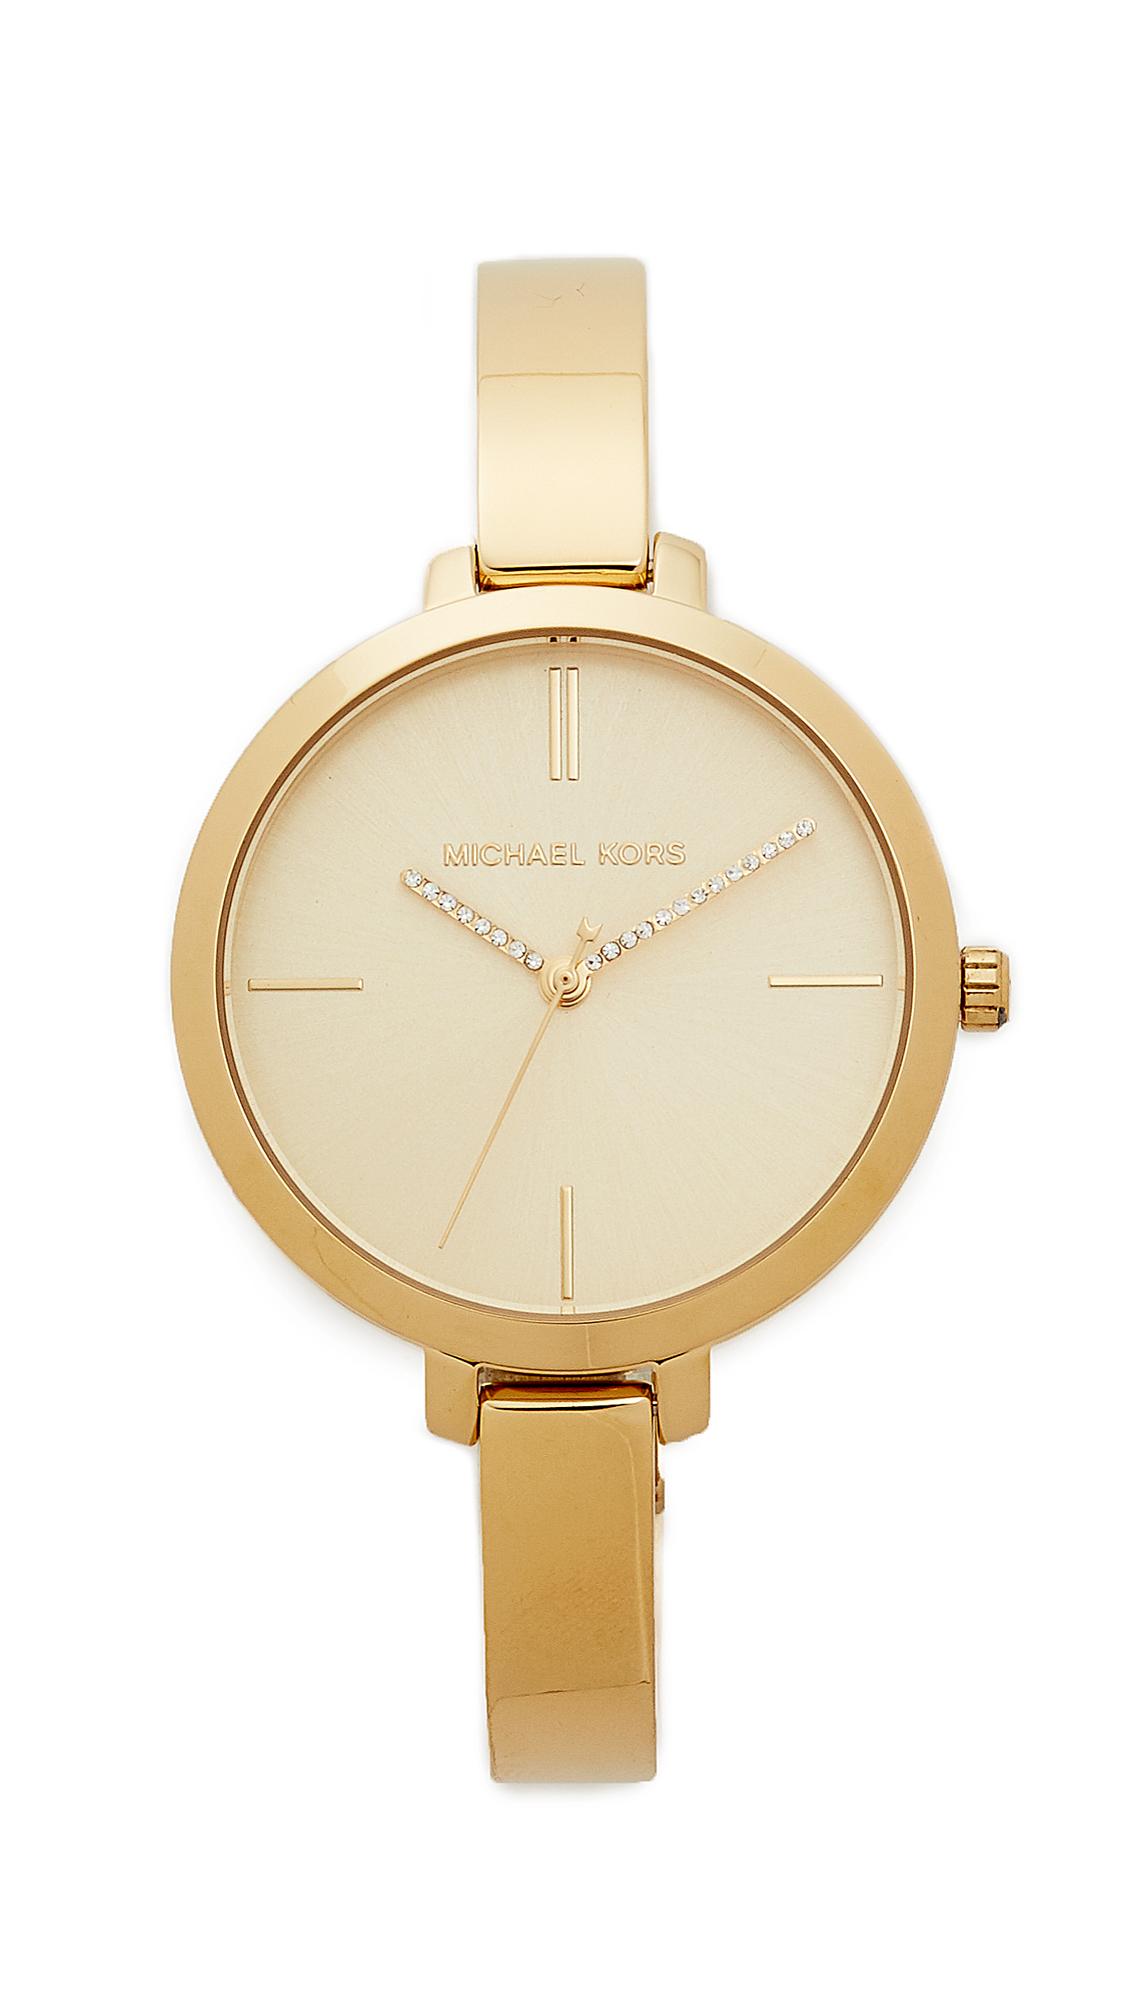 Michael Kors Jayrn Bangle Watch, 36mm